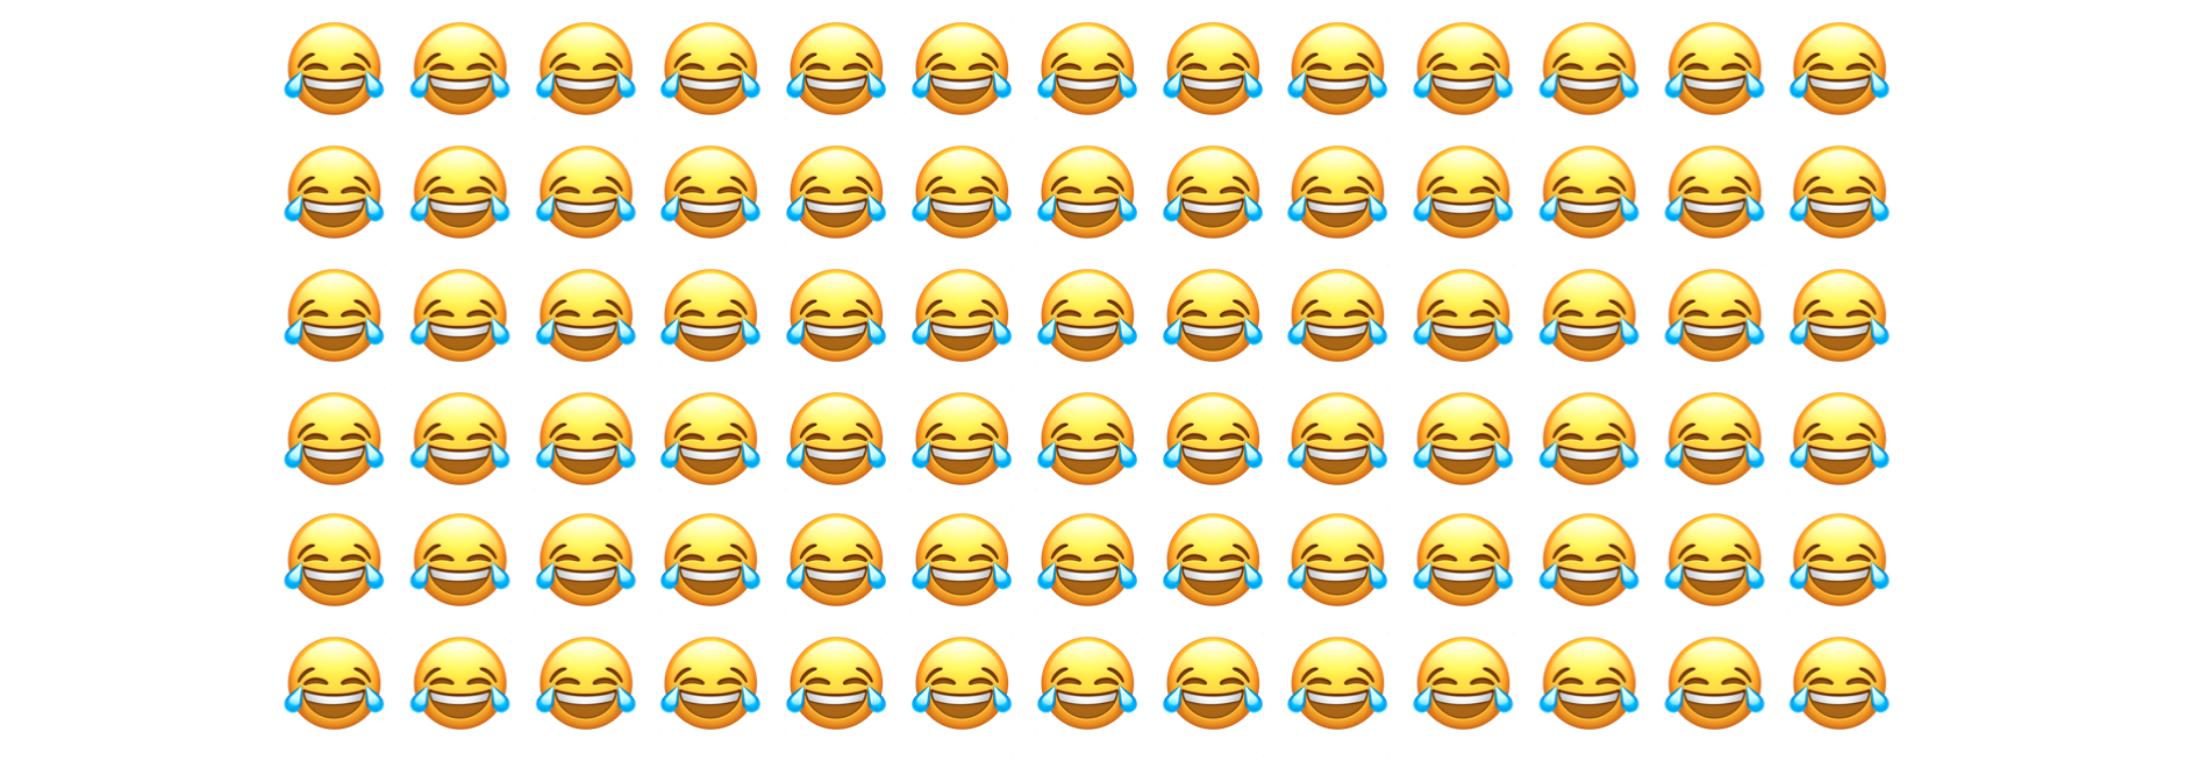 🤓 6 Facts About Emojis Found Using New Analysis 🤓 | Brandwatch